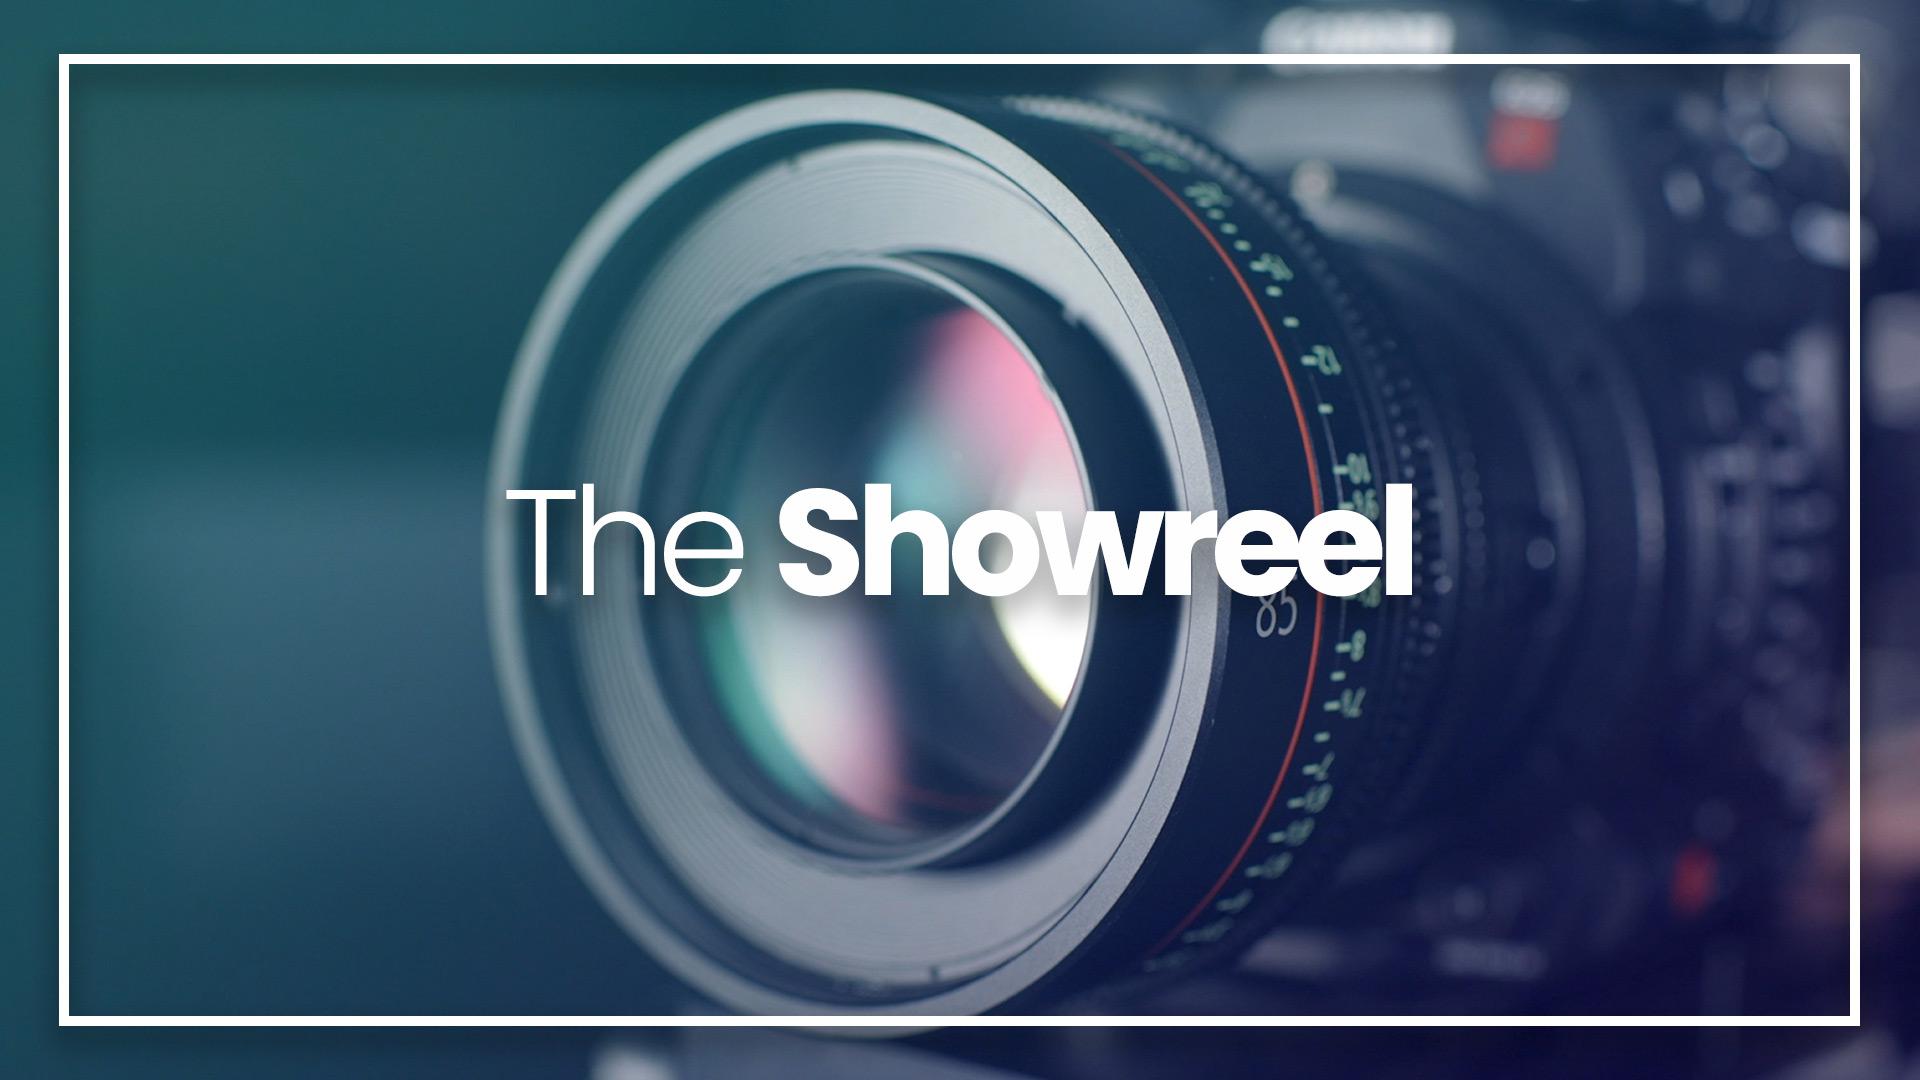 Image of a Camera